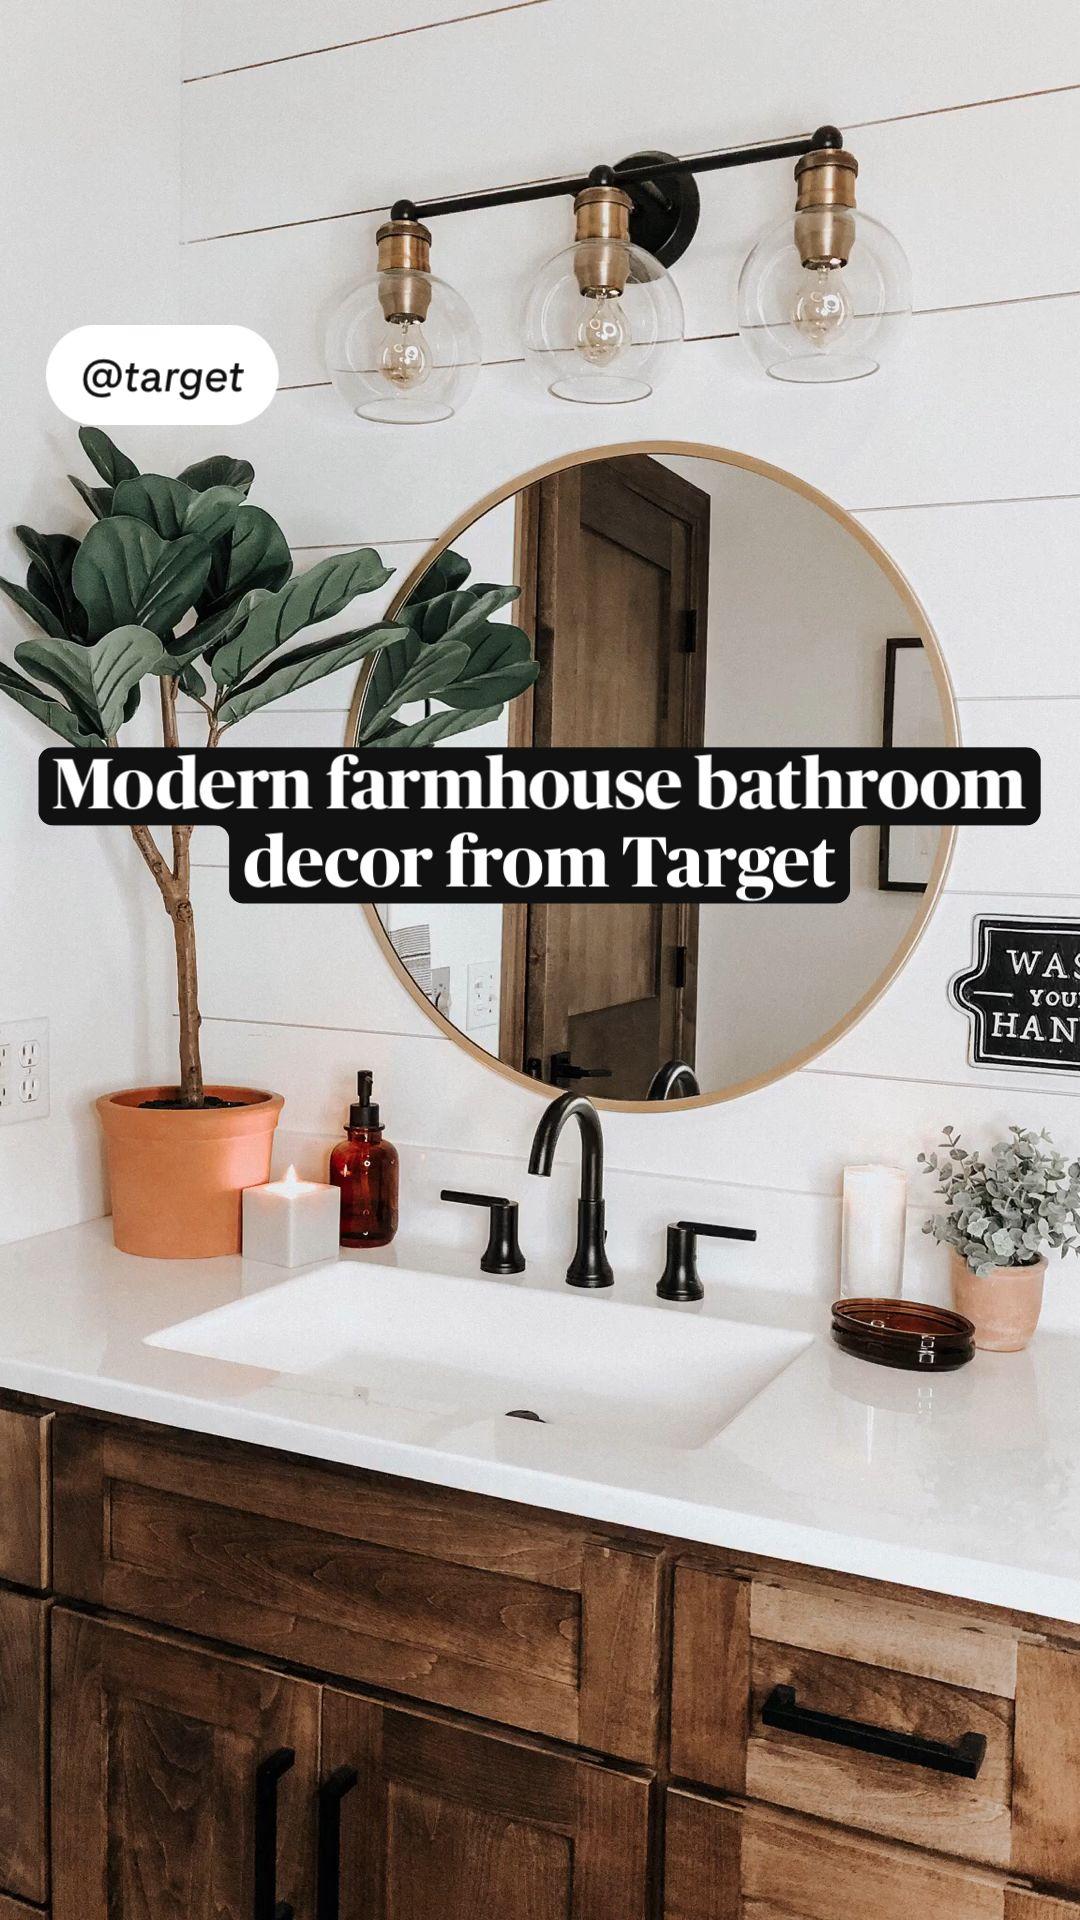 Modern Farmhouse Bathroom Decor From Target An Immersive Guide By Bailey Huffman Bathroom decor at target